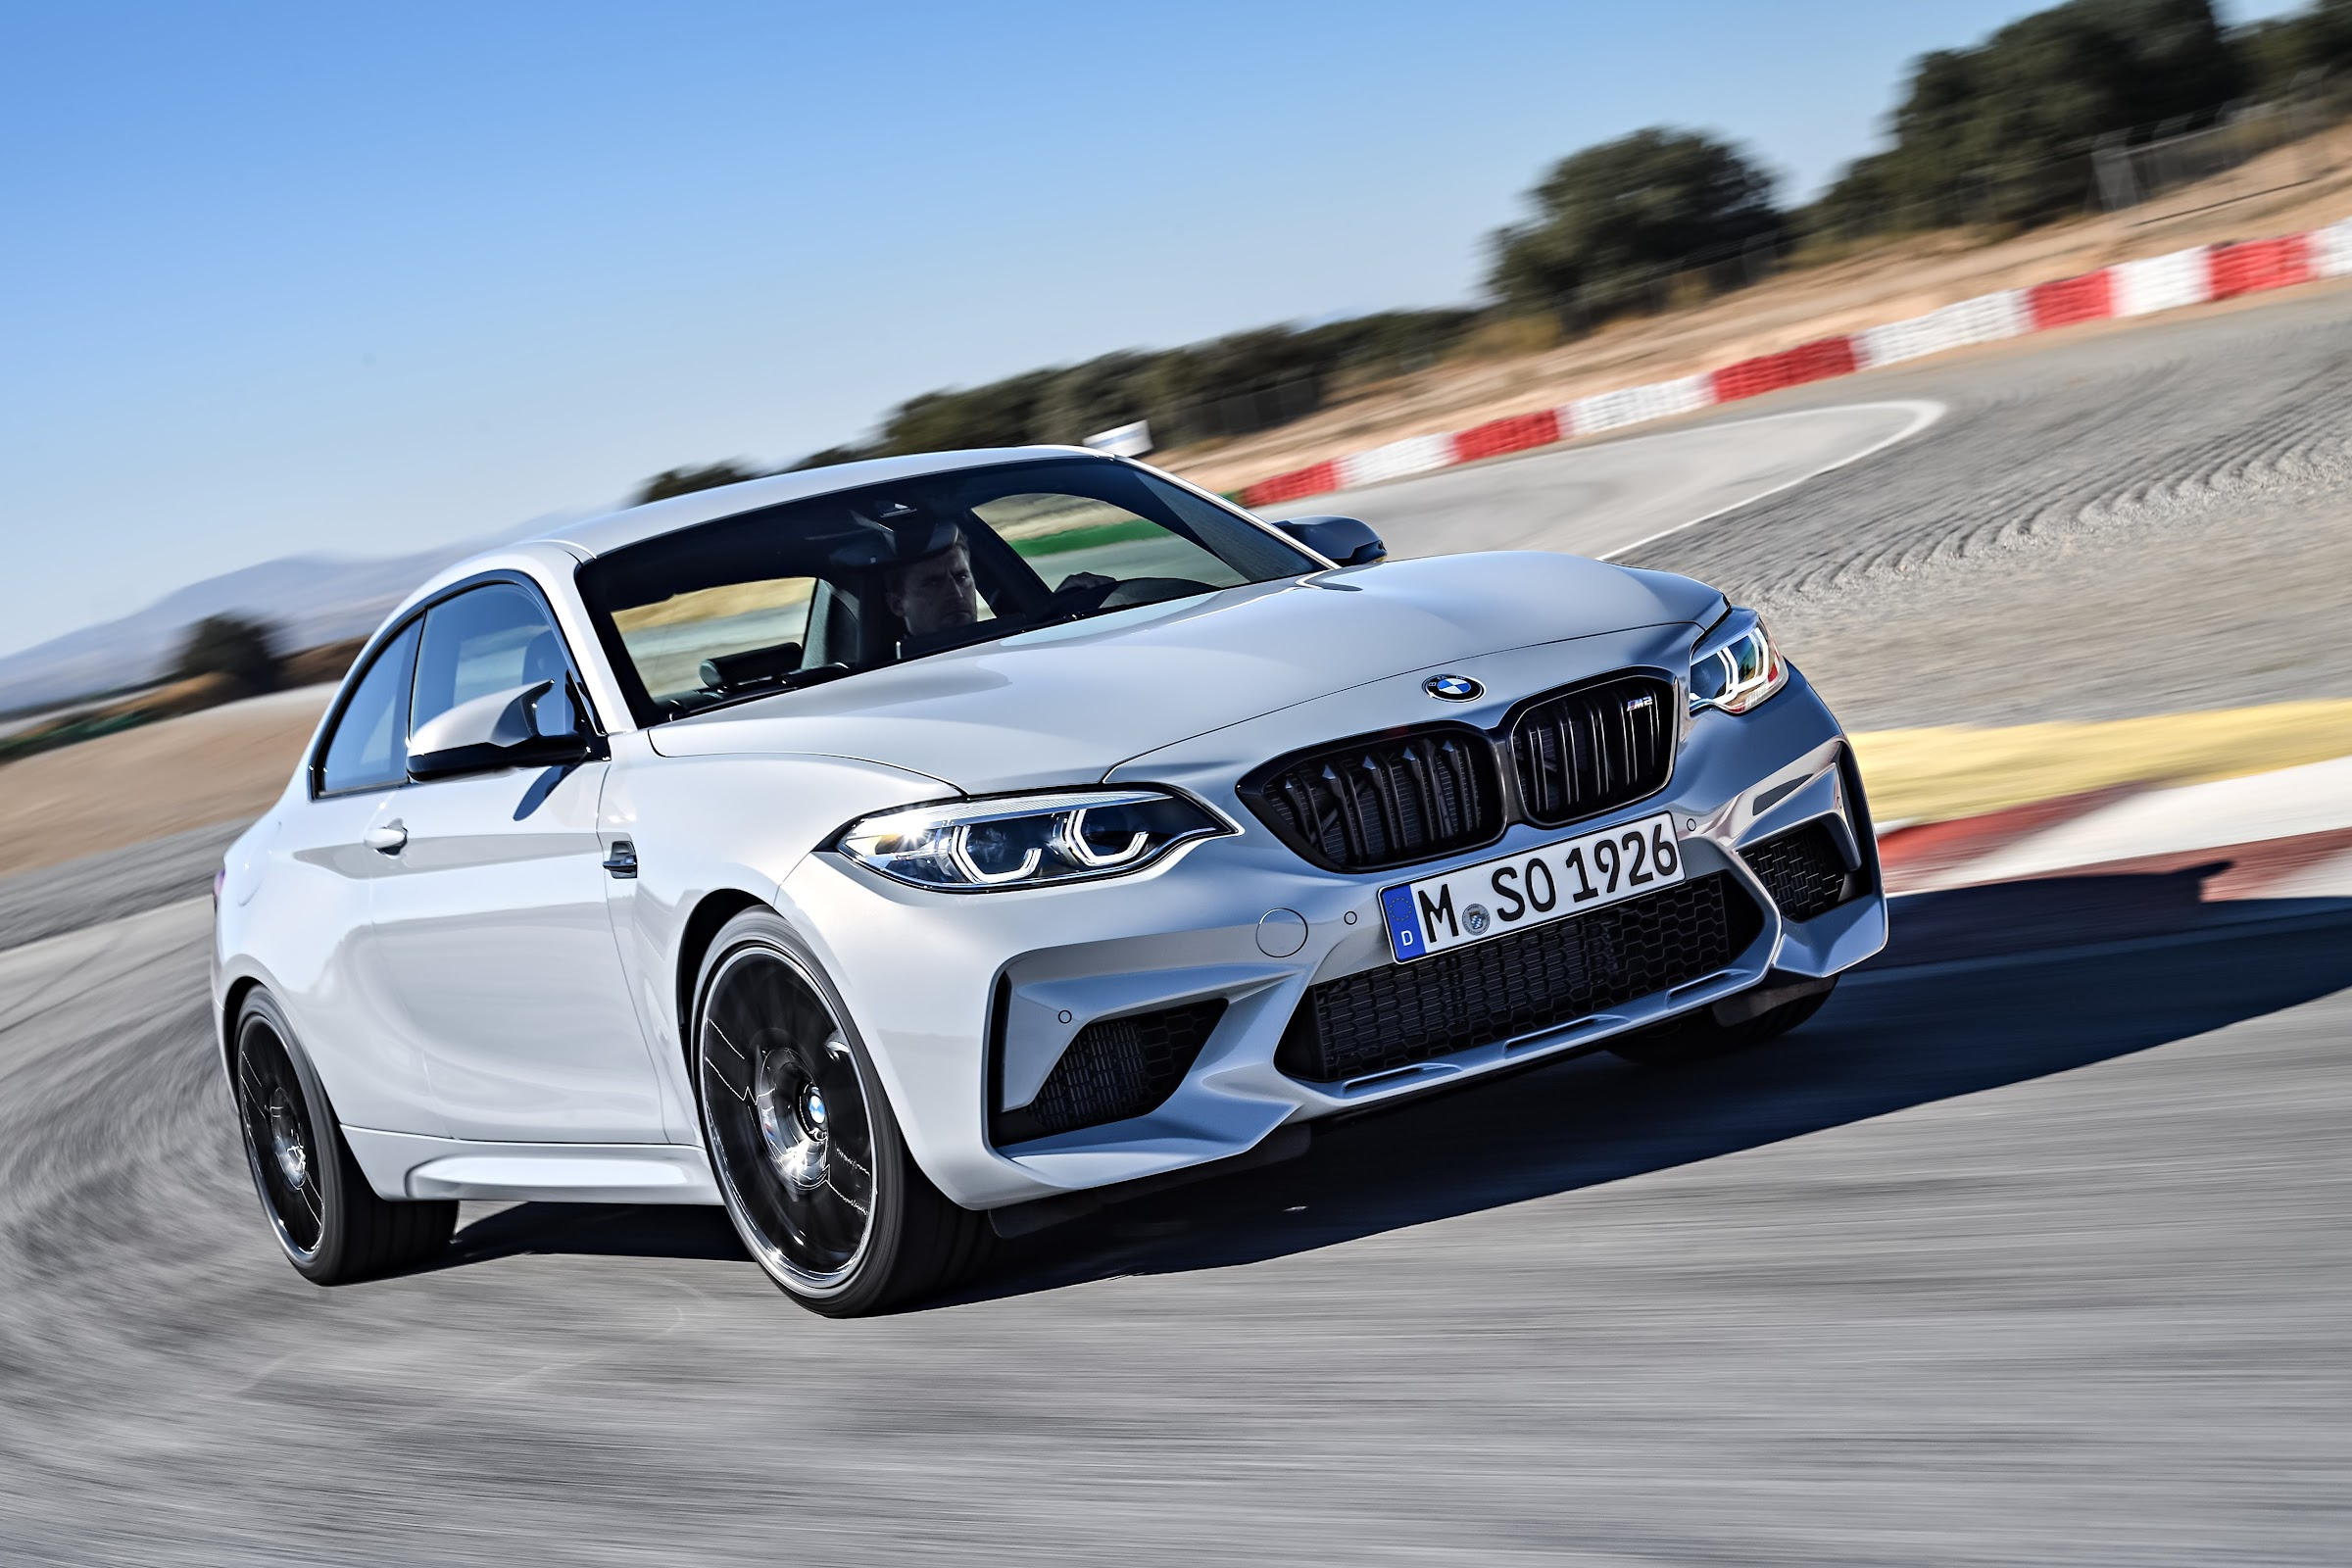 2dDmvQv TcG70Fv8wAX5O GDlI5jXuMAfFOoOkxrc68TTmPJoPOEfqlTzJPDeCvAKotspVcvWSD0S8kR99tDK8vkUtGZUYvjjAtoyGnrEUP5YoMHswnZkmLUXn4RxkM9q8C8o3JTXg=w2400 - Galería fotográfica: BMW M2 Competition